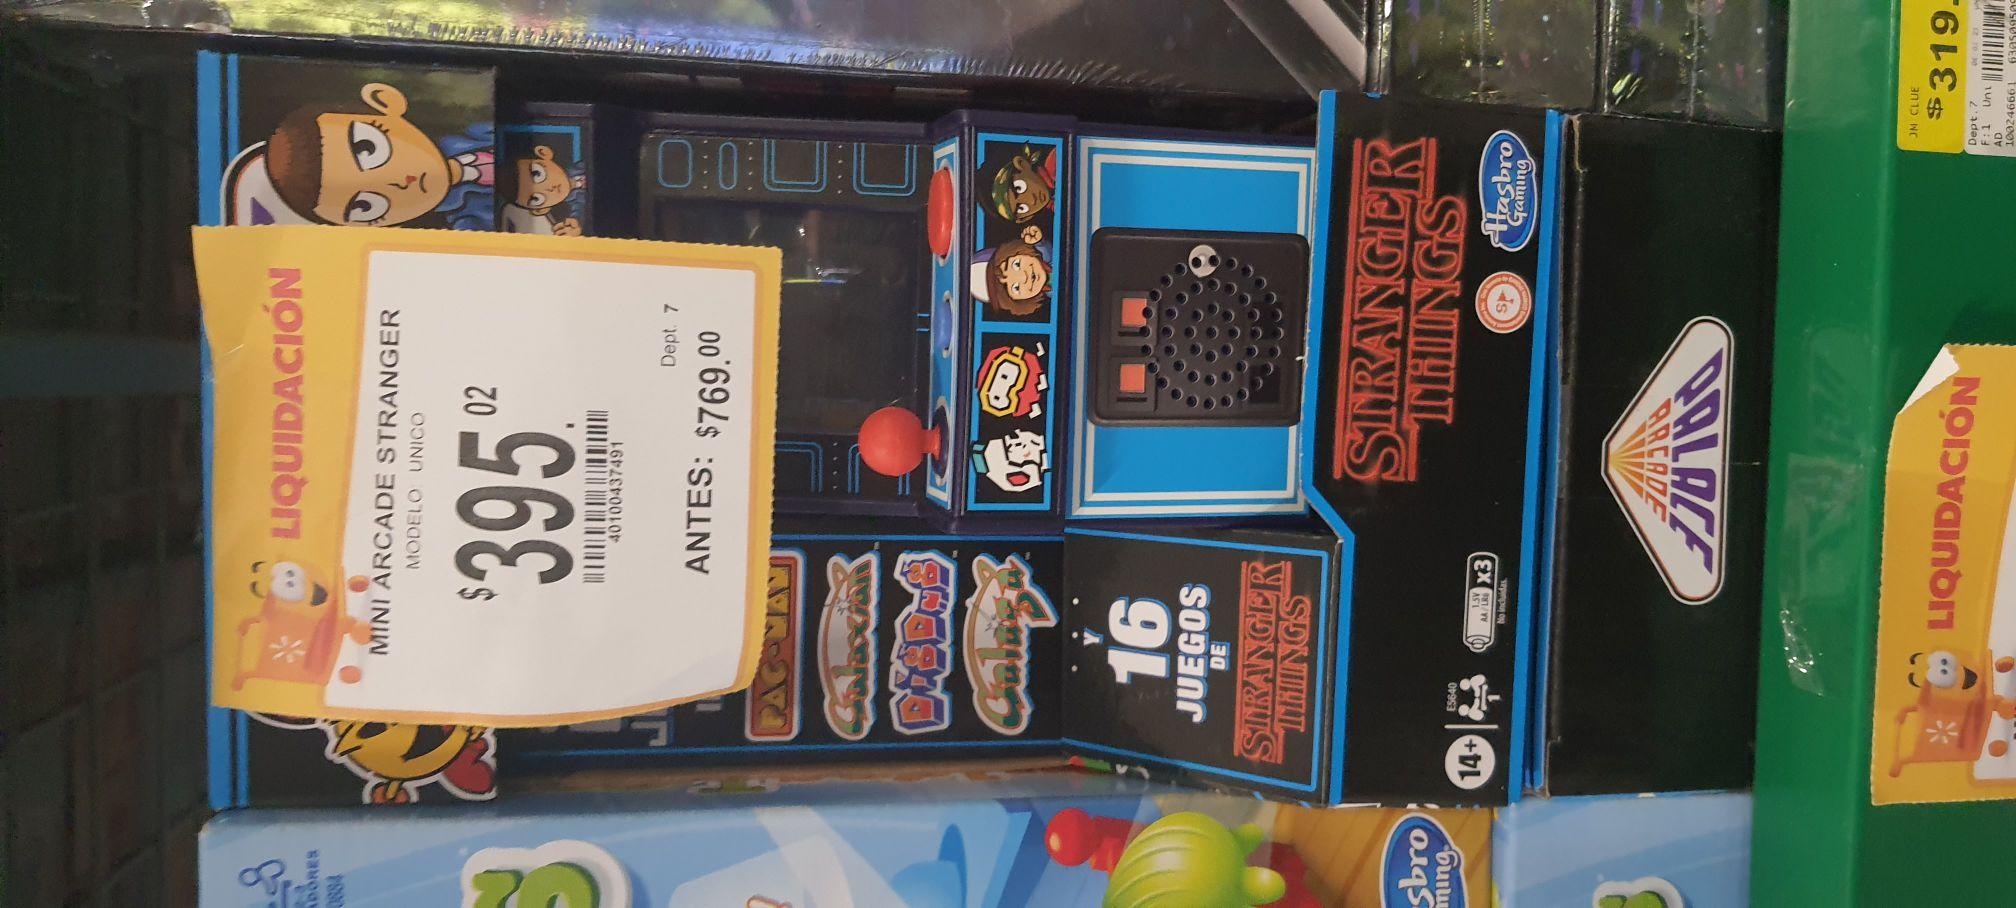 Walmart: Mini arcade Stranger Things